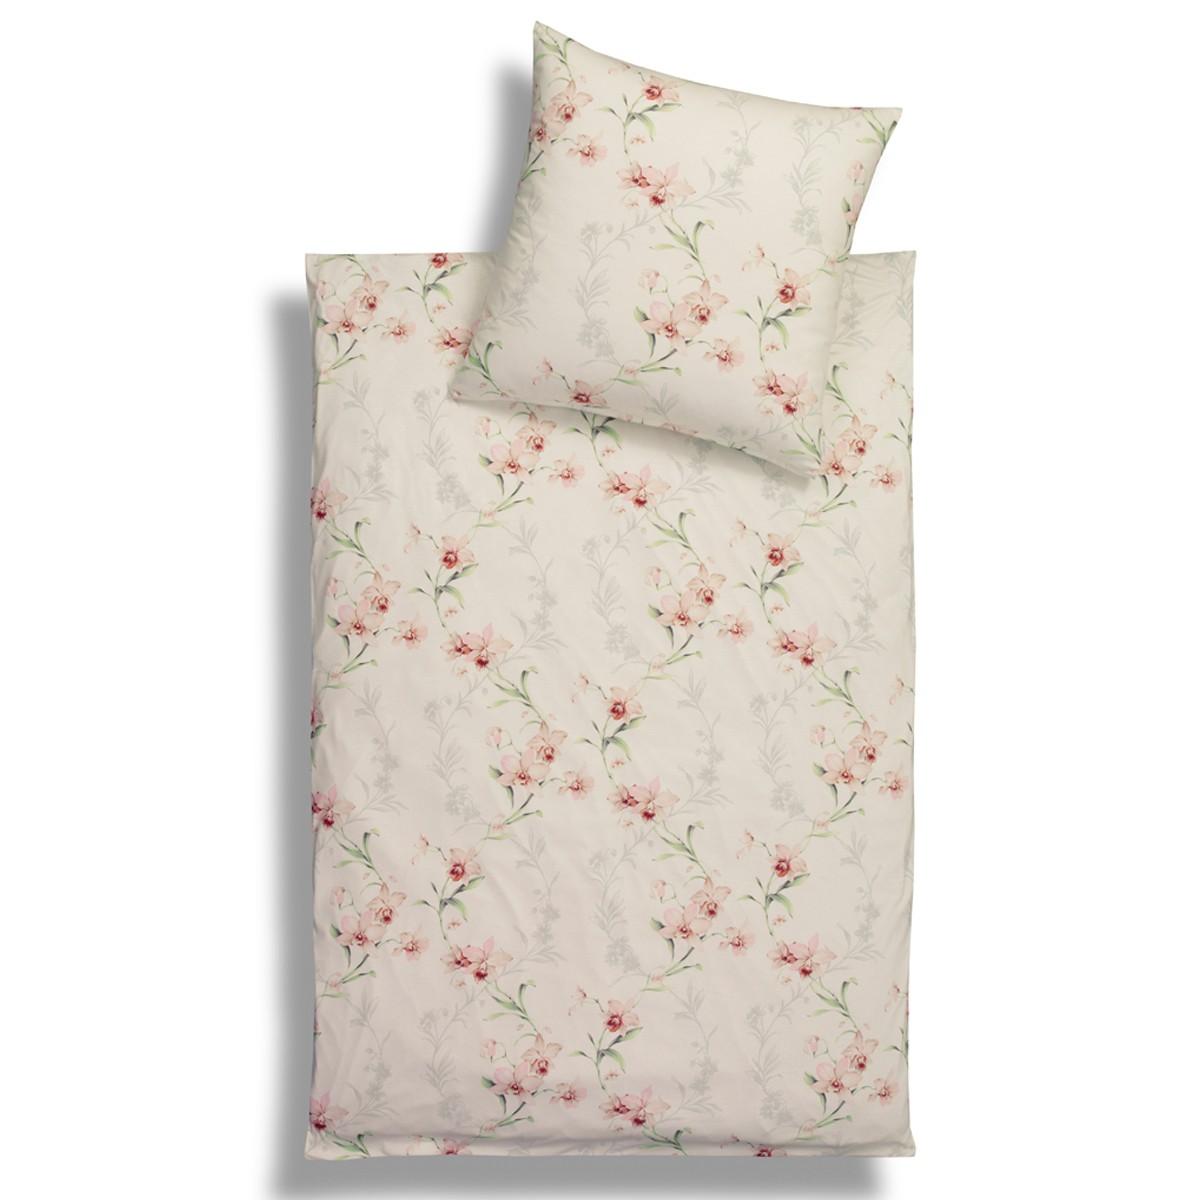 interlock jersey bettw sche estella fedora magnolia. Black Bedroom Furniture Sets. Home Design Ideas